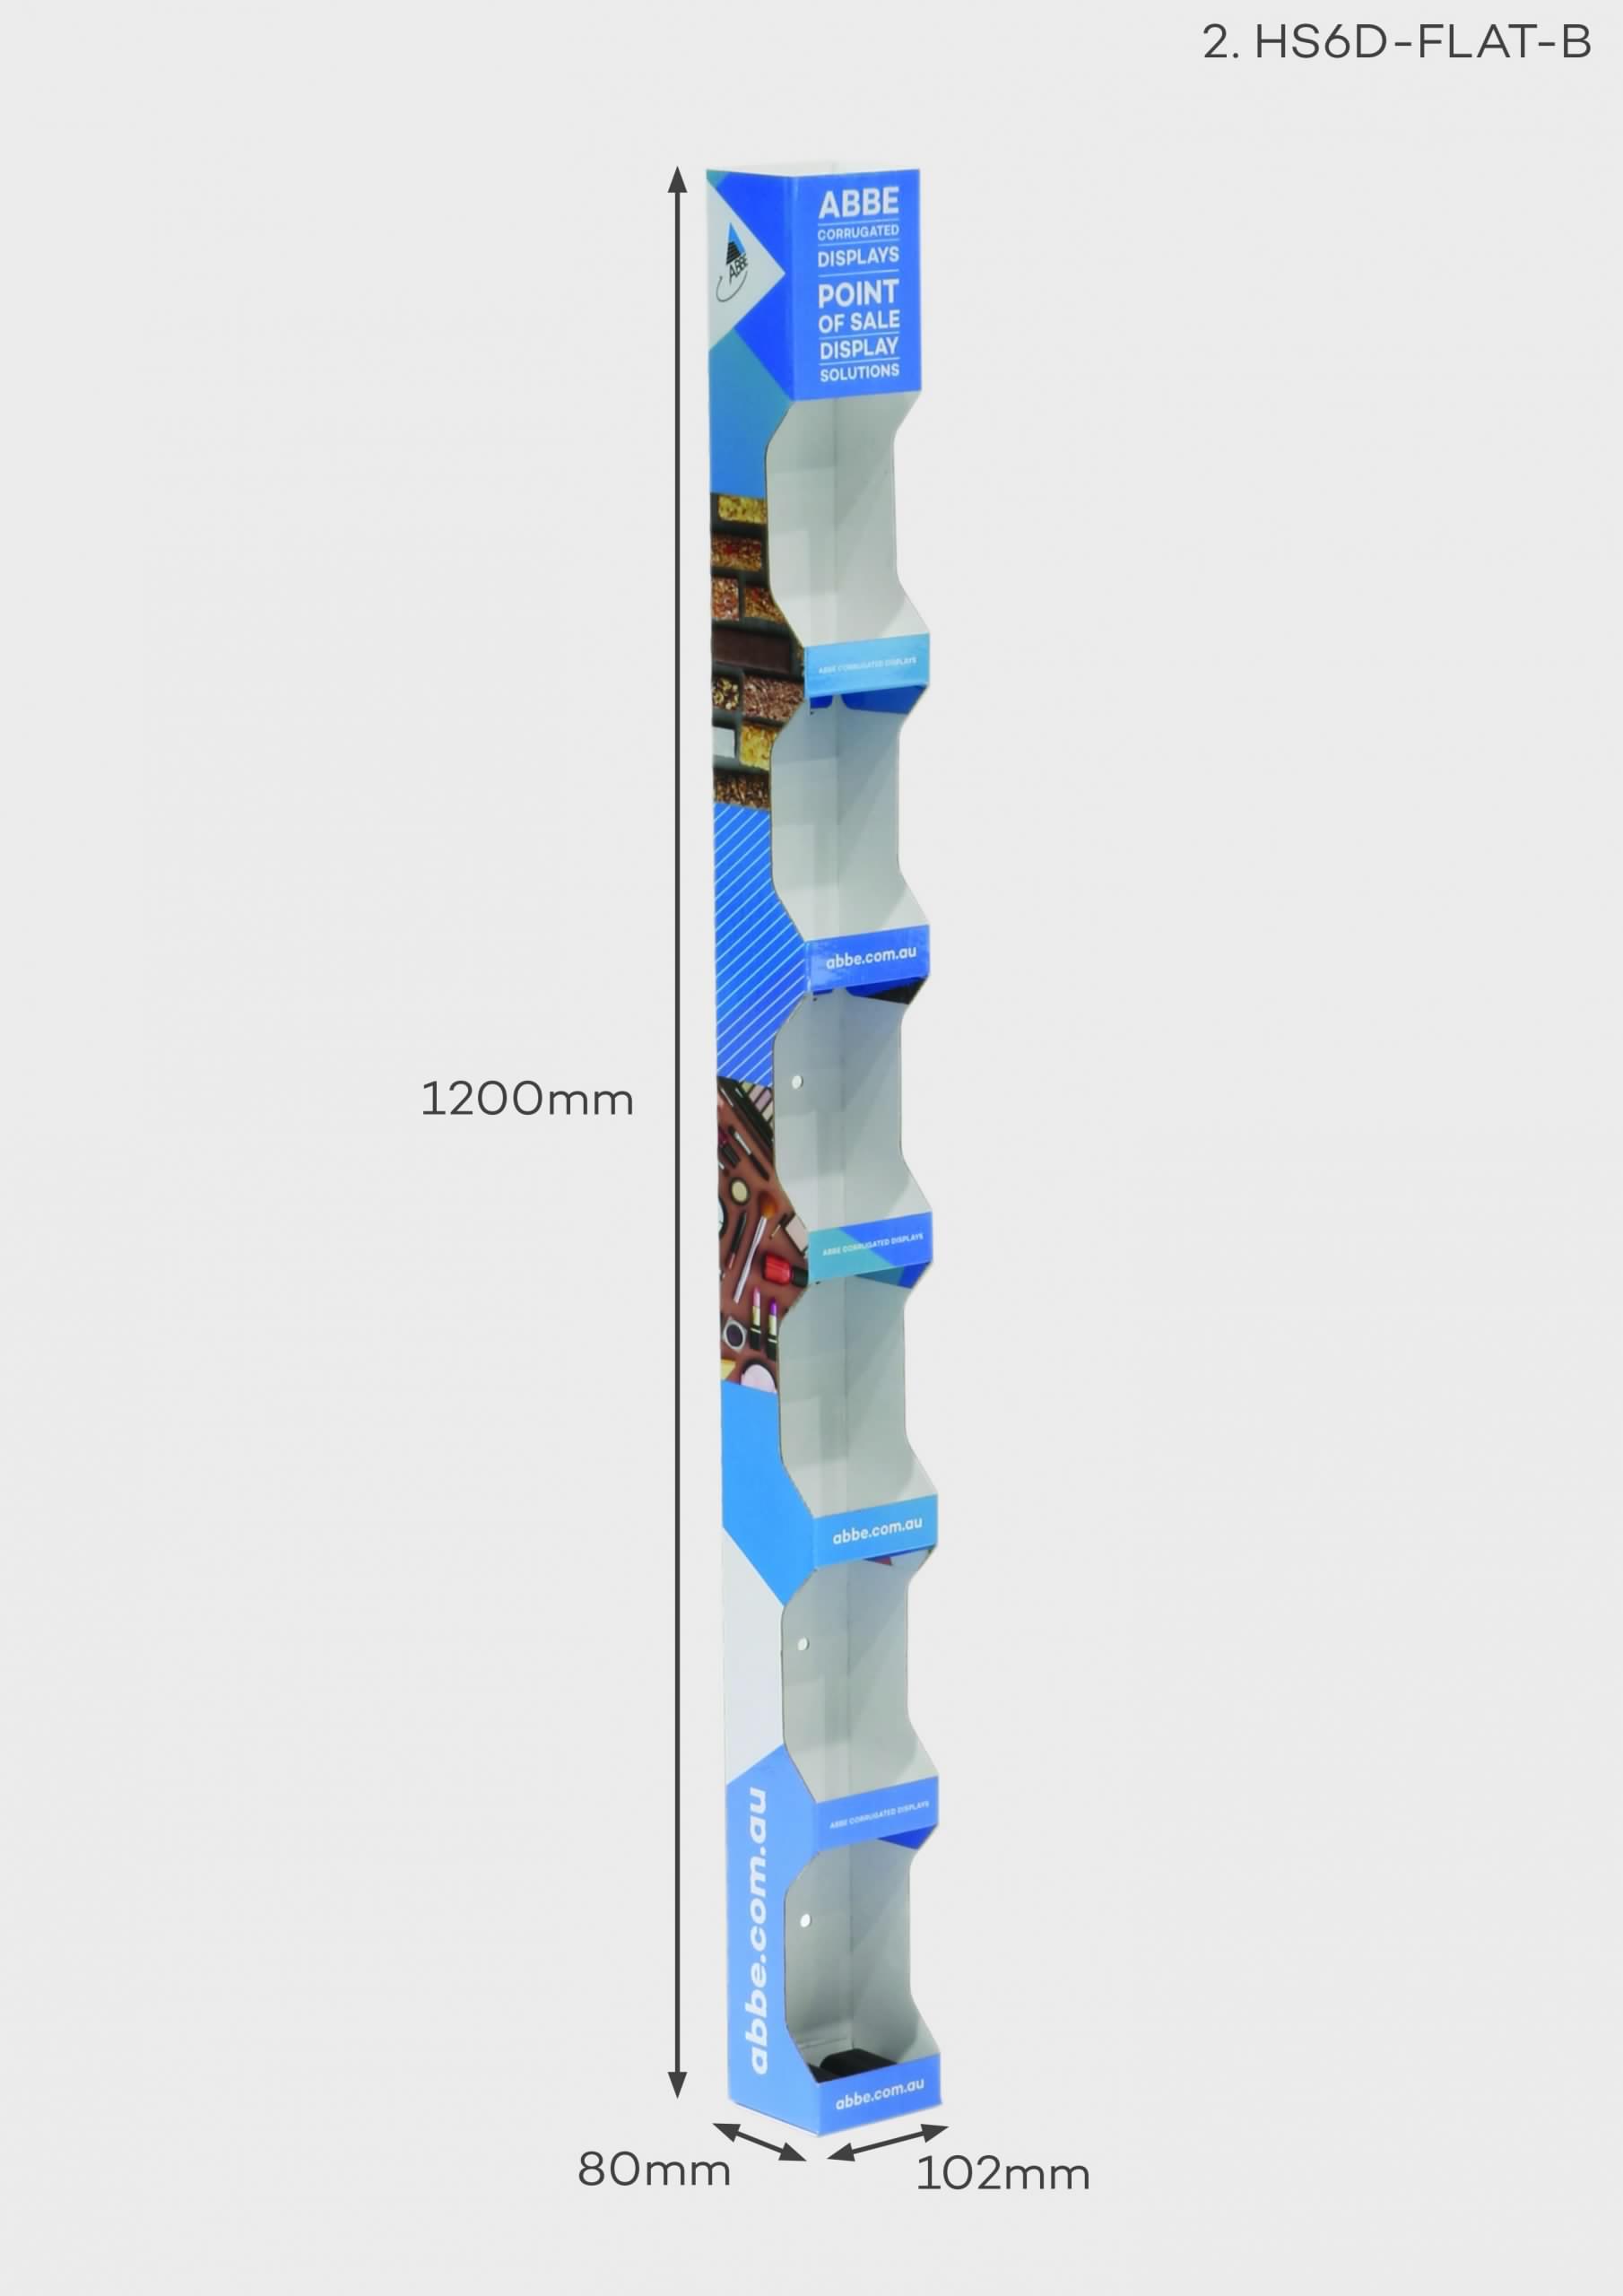 6 Shelf Hangsell Display (Ref HS6D-FLAT-B)